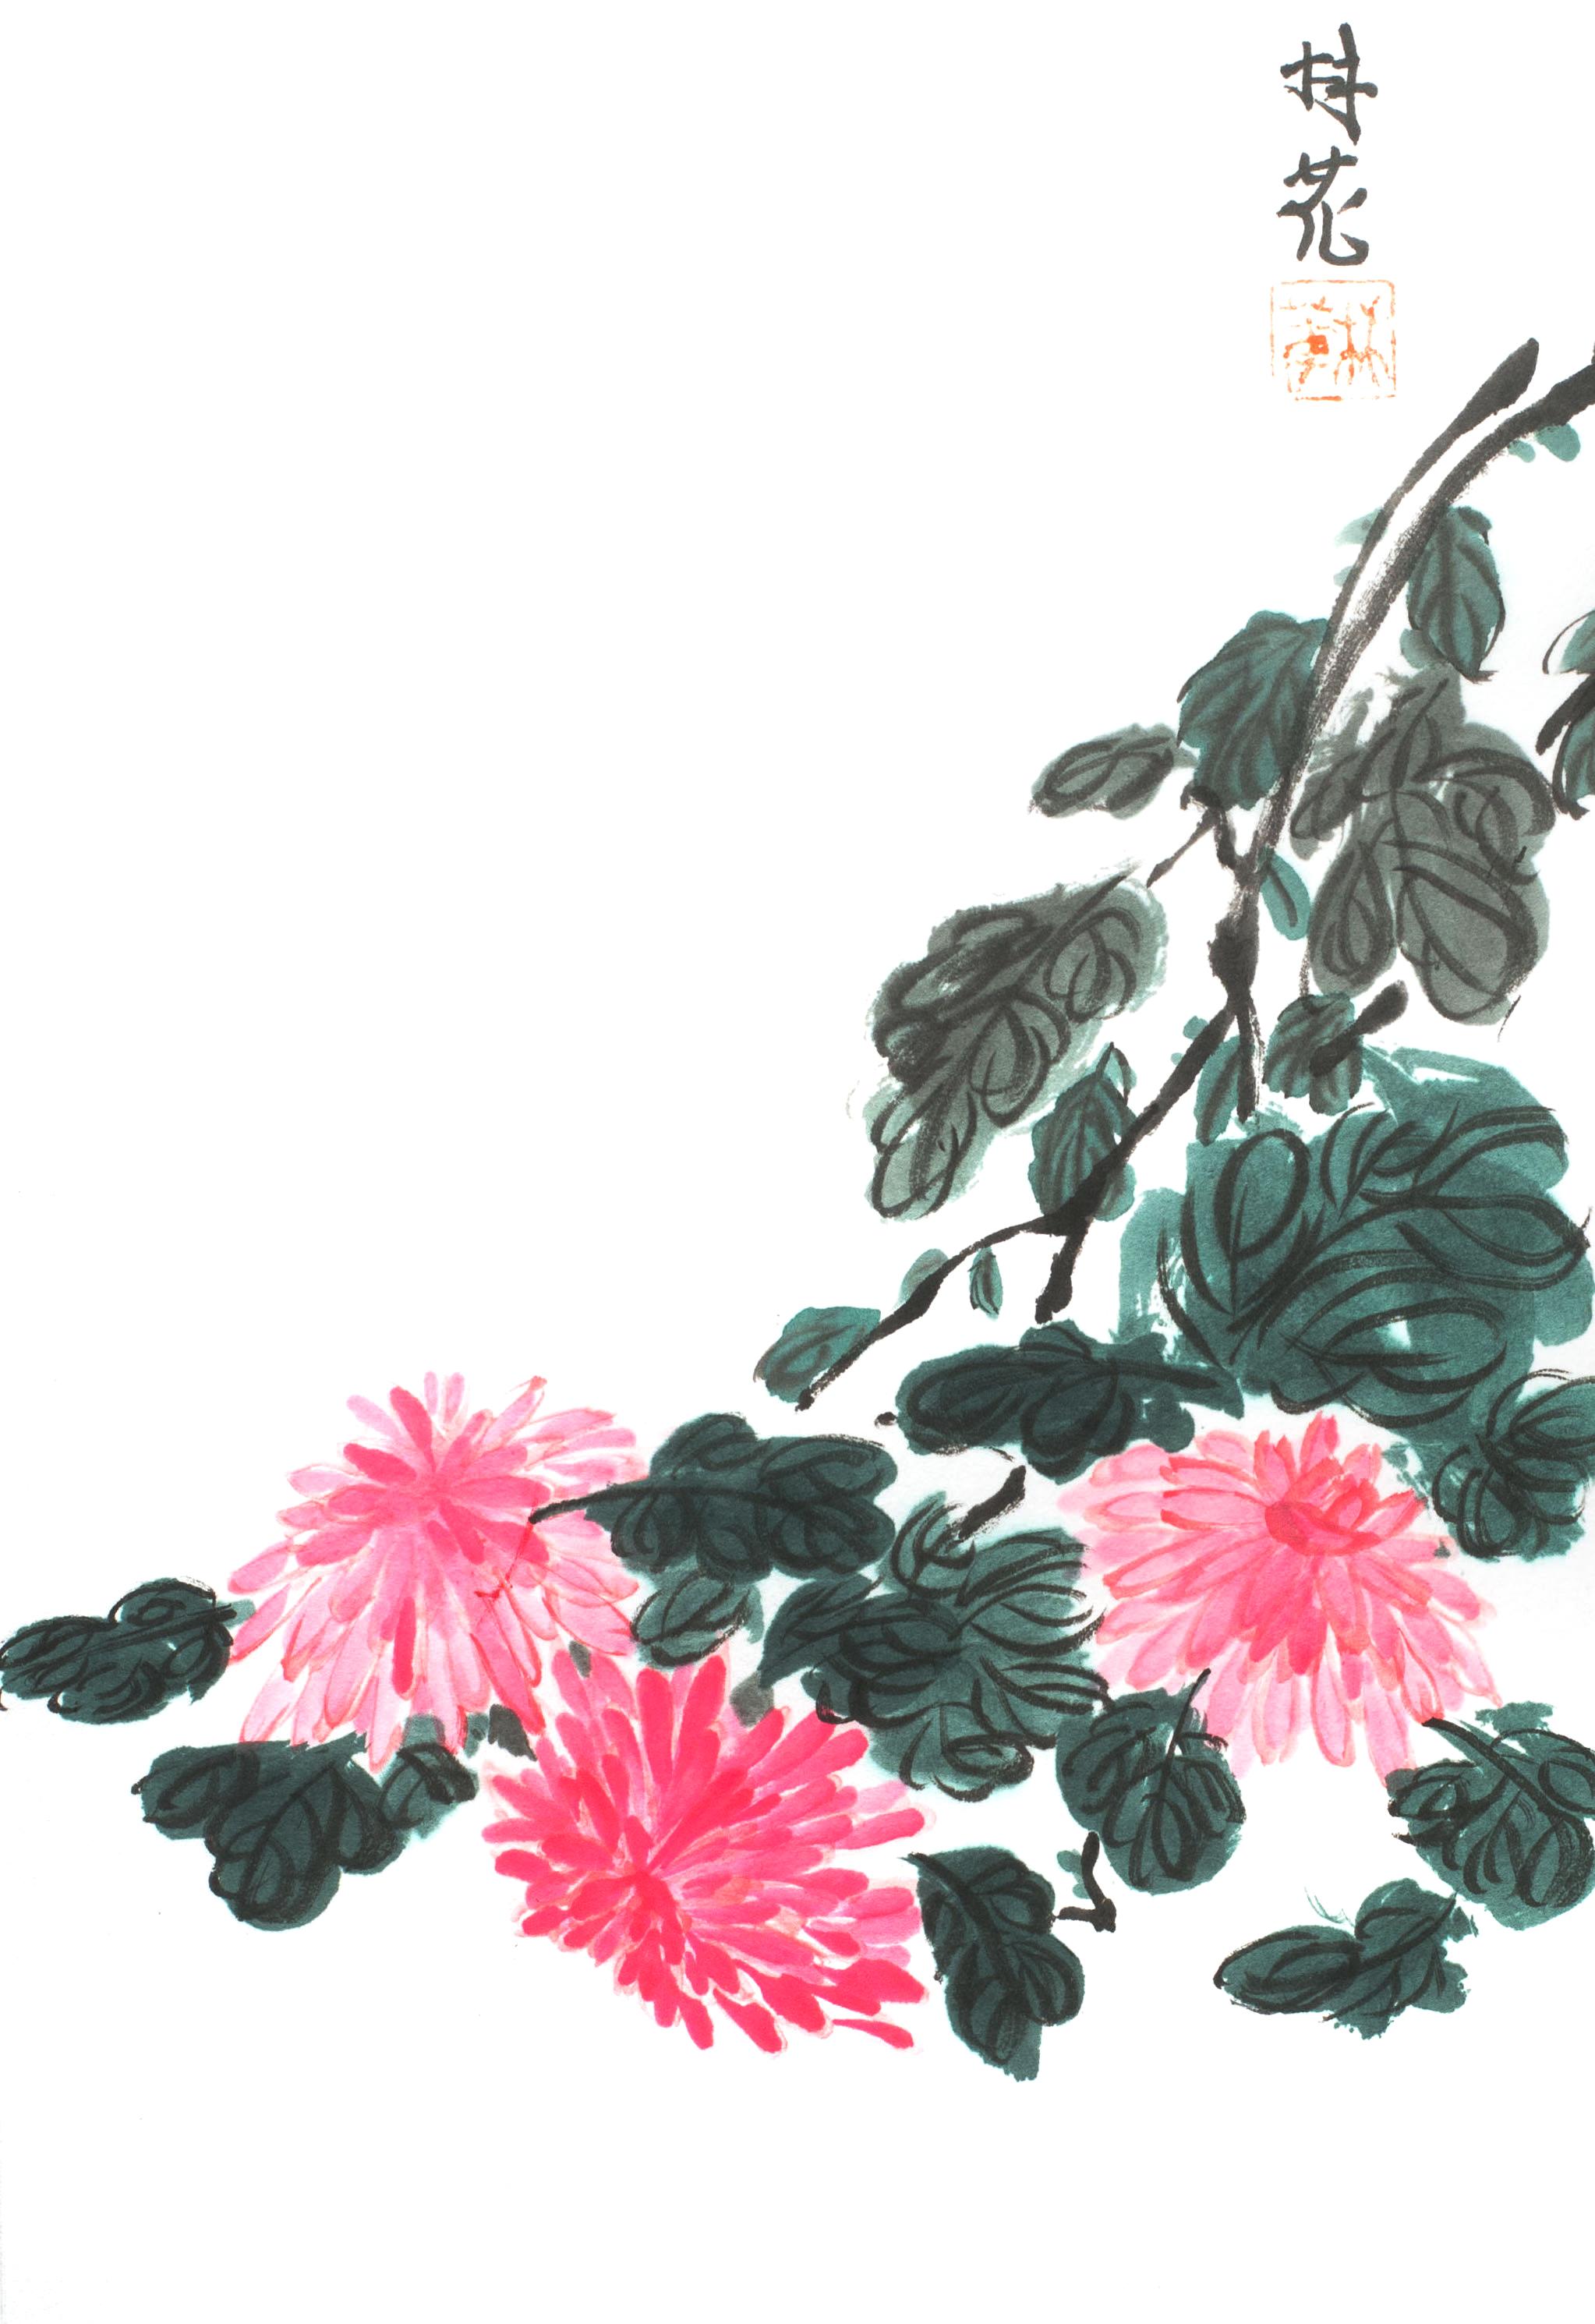 Chrysanthemum 4 Gentlemen 4.jpg